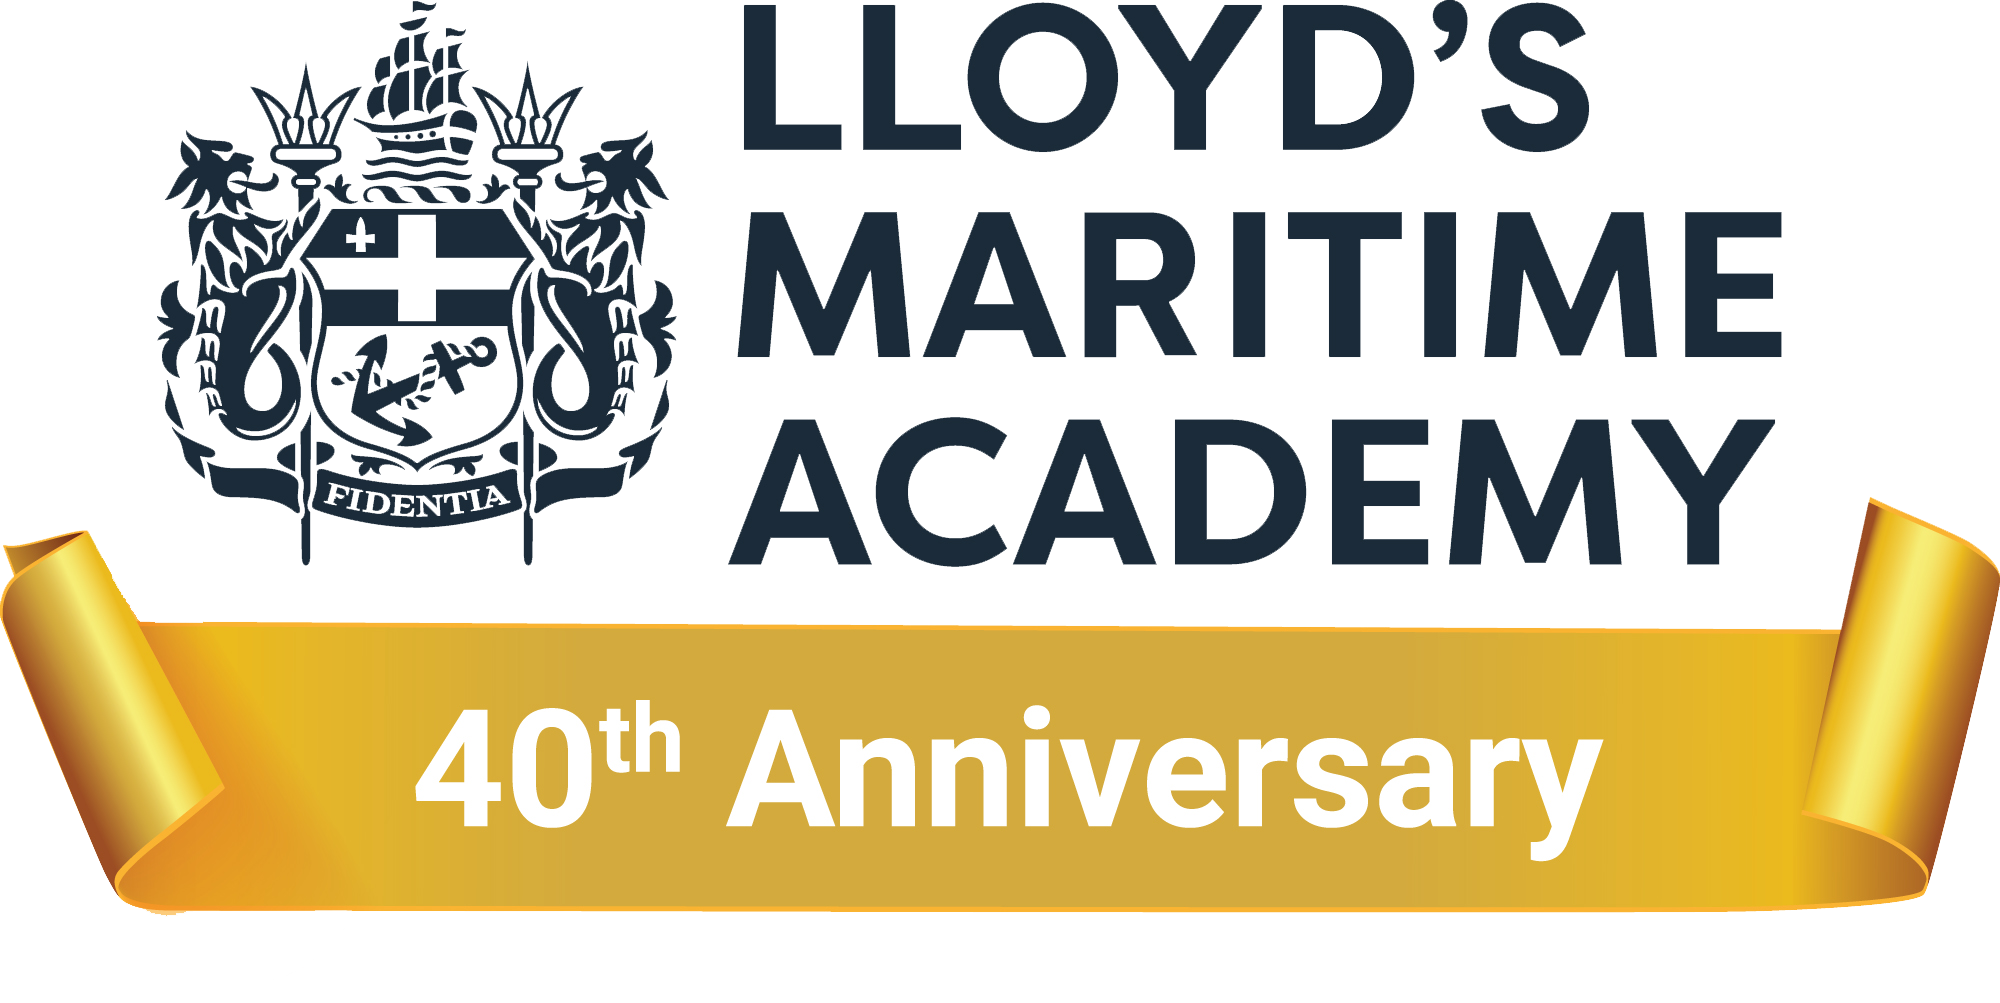 40th Anniversary Of Lloyds Maritime Academy Sponsored Post